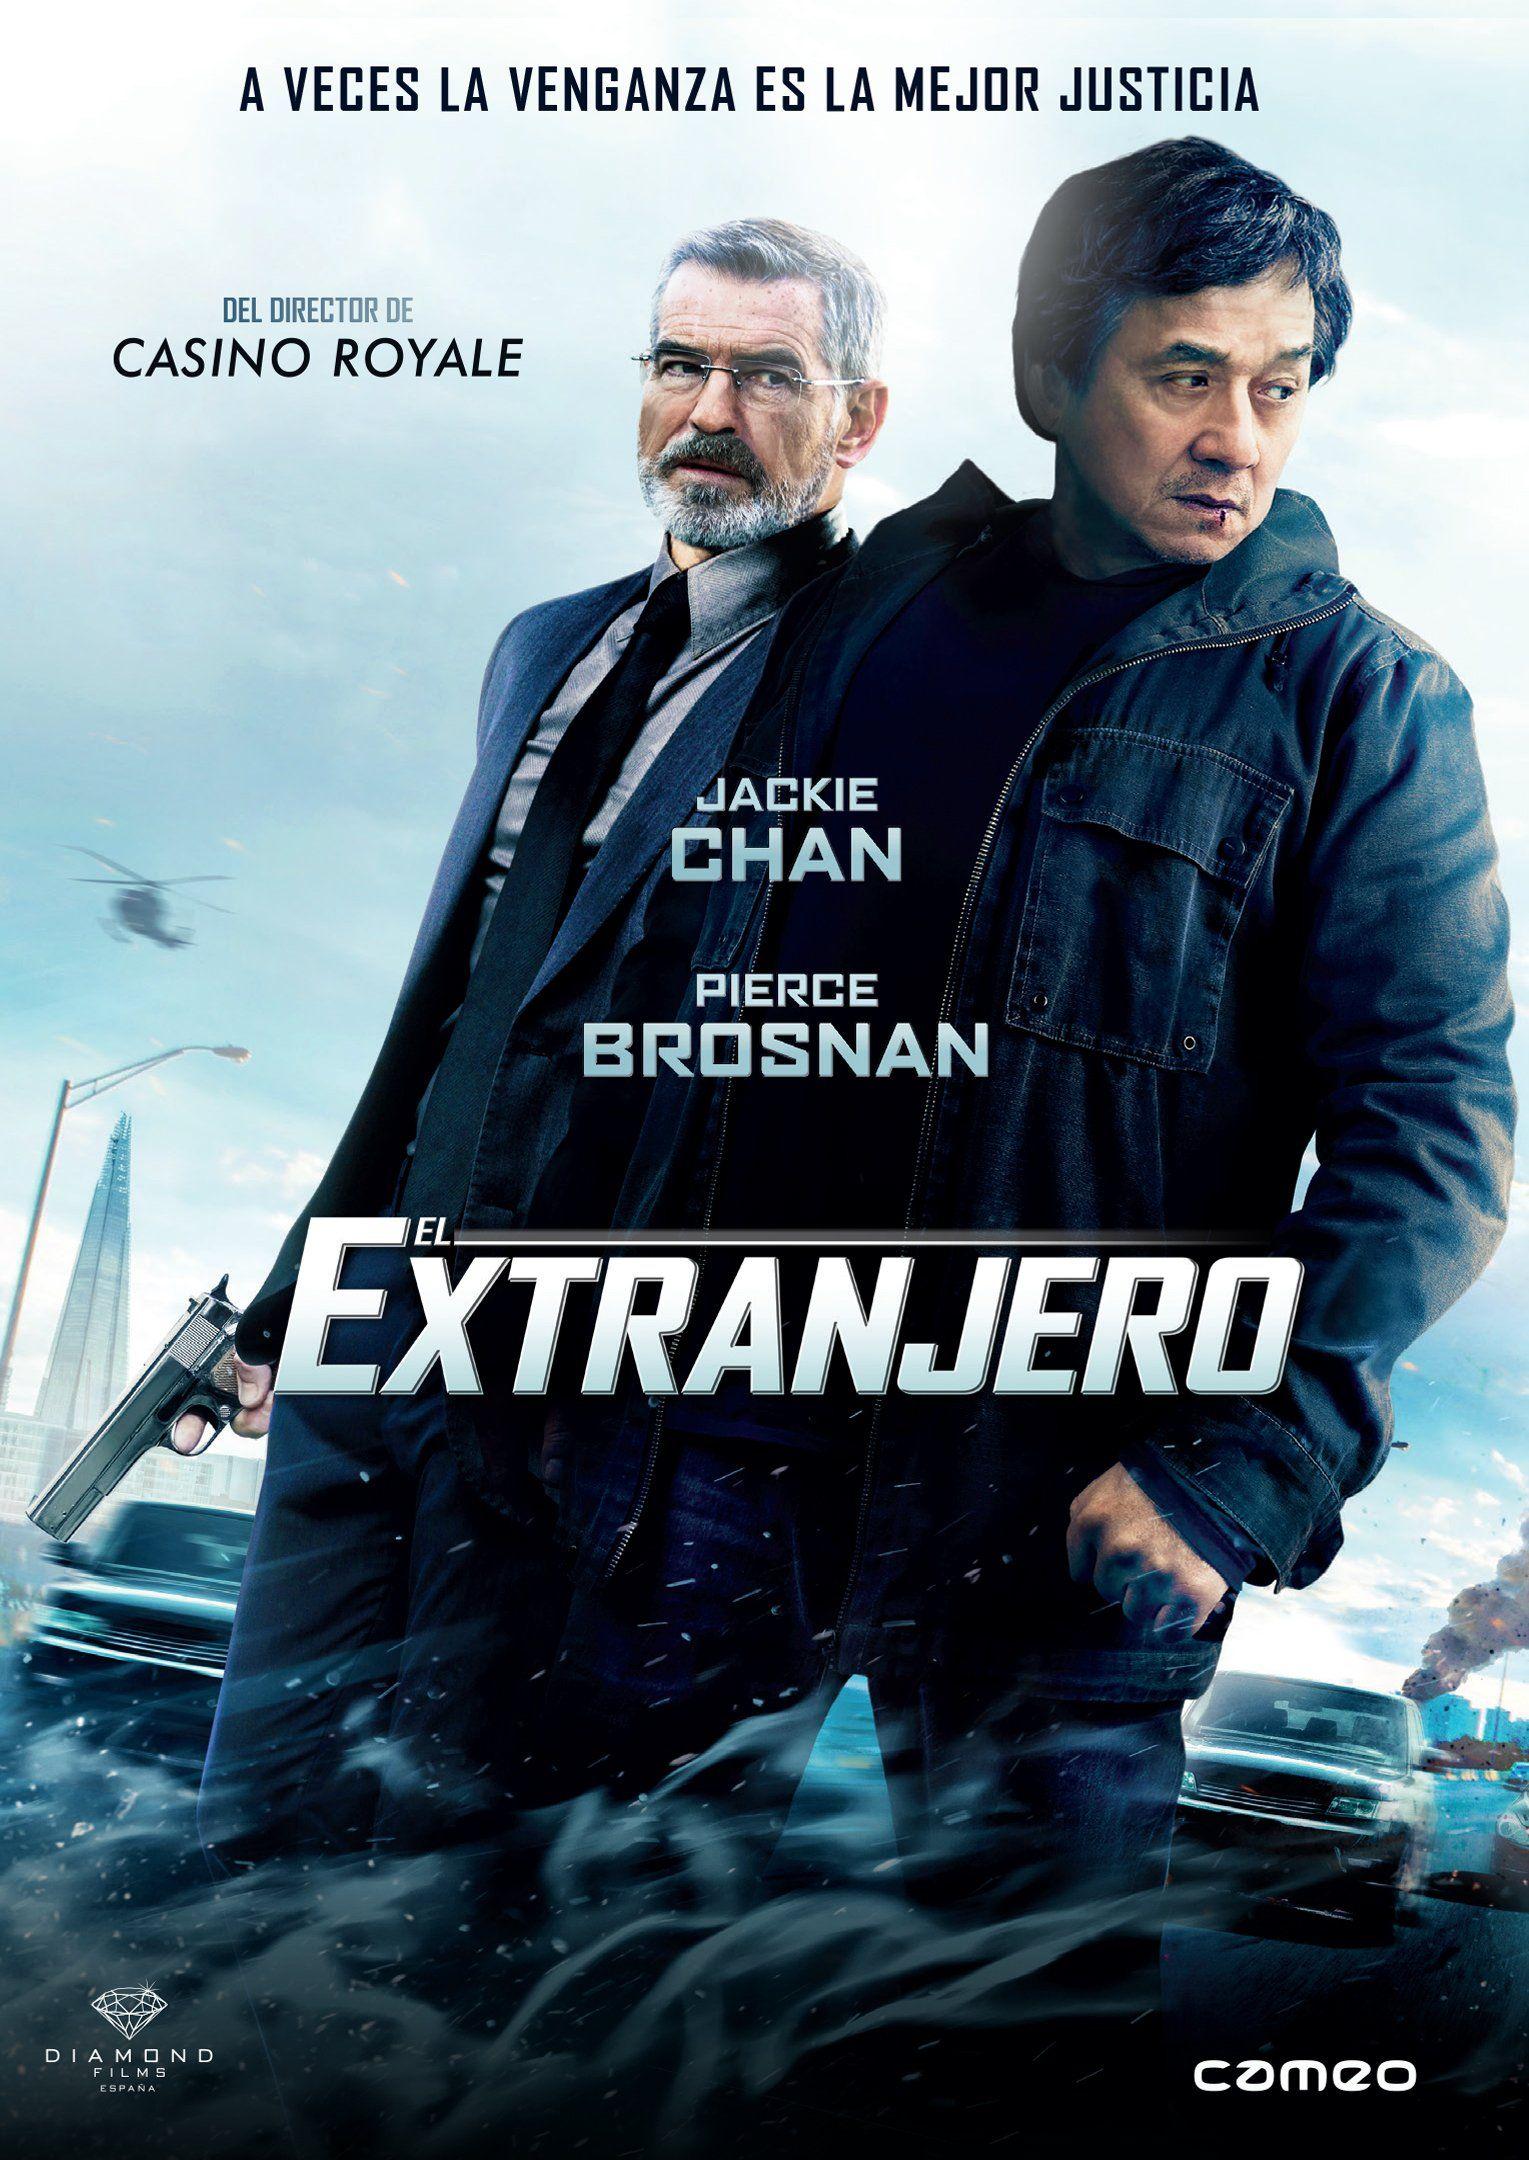 Pin De Andreas Pohl En Jackie Chan Movie Pierce Brosnan Jackie Chan Casino Royale